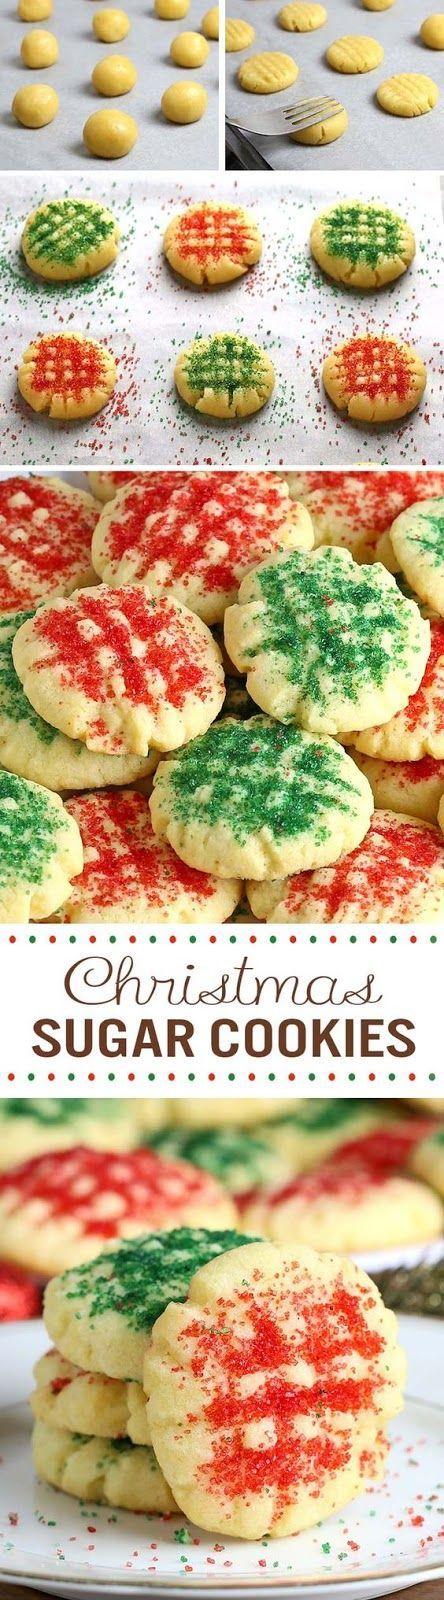 Traditional Christmas Holidays Cookie Recipes Christmas sugar